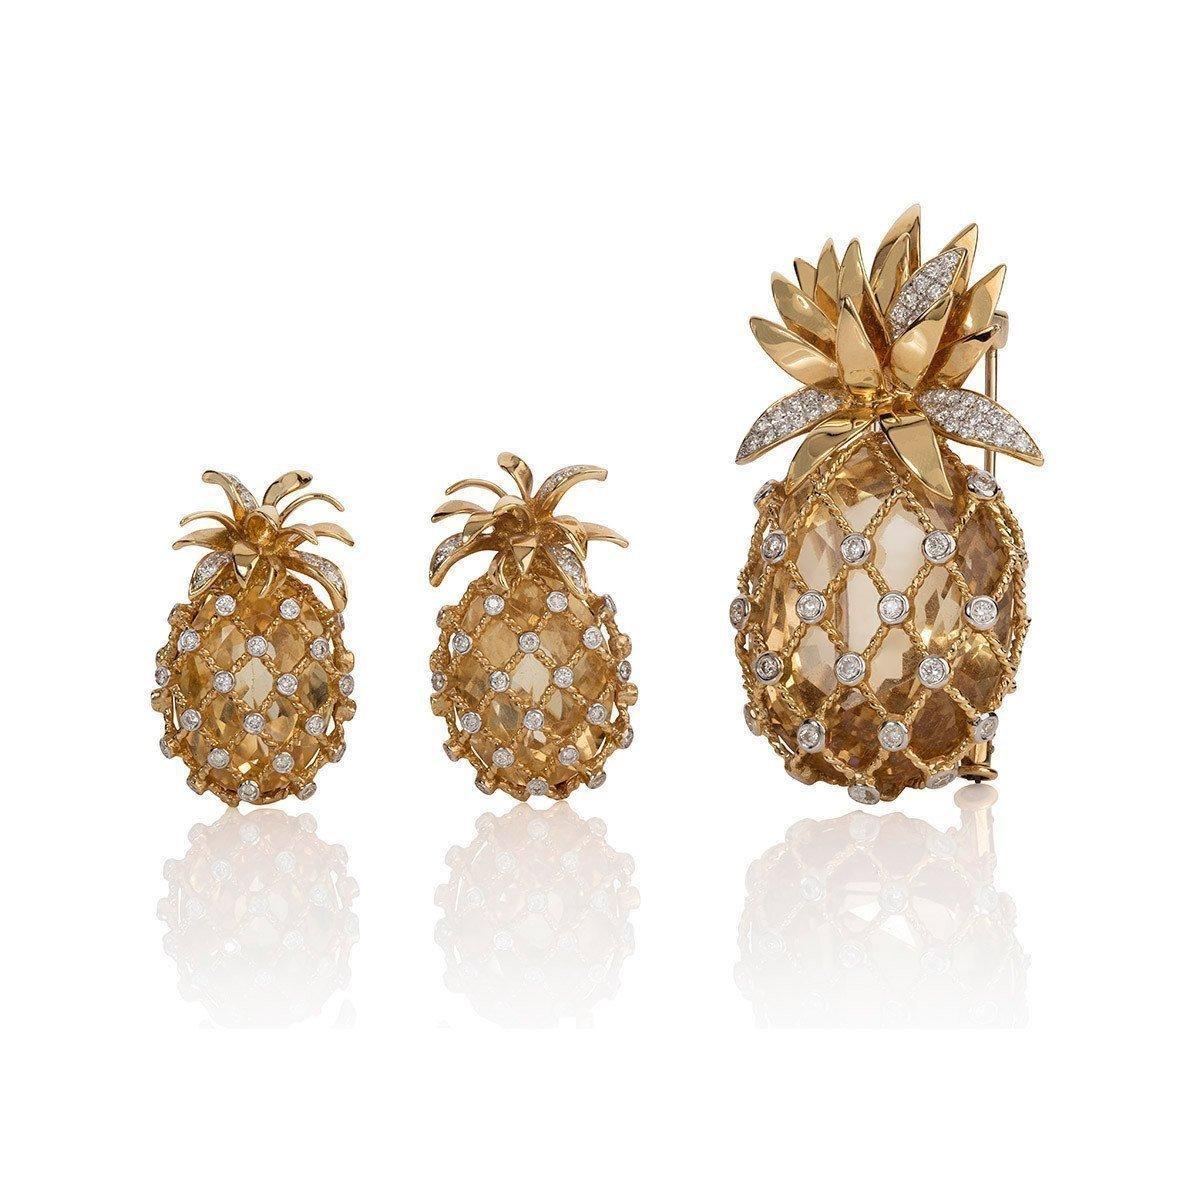 Mara Hotung 18kt Yellow Gold Pineapple Brooch With Citrine & Diamonds in Metallic